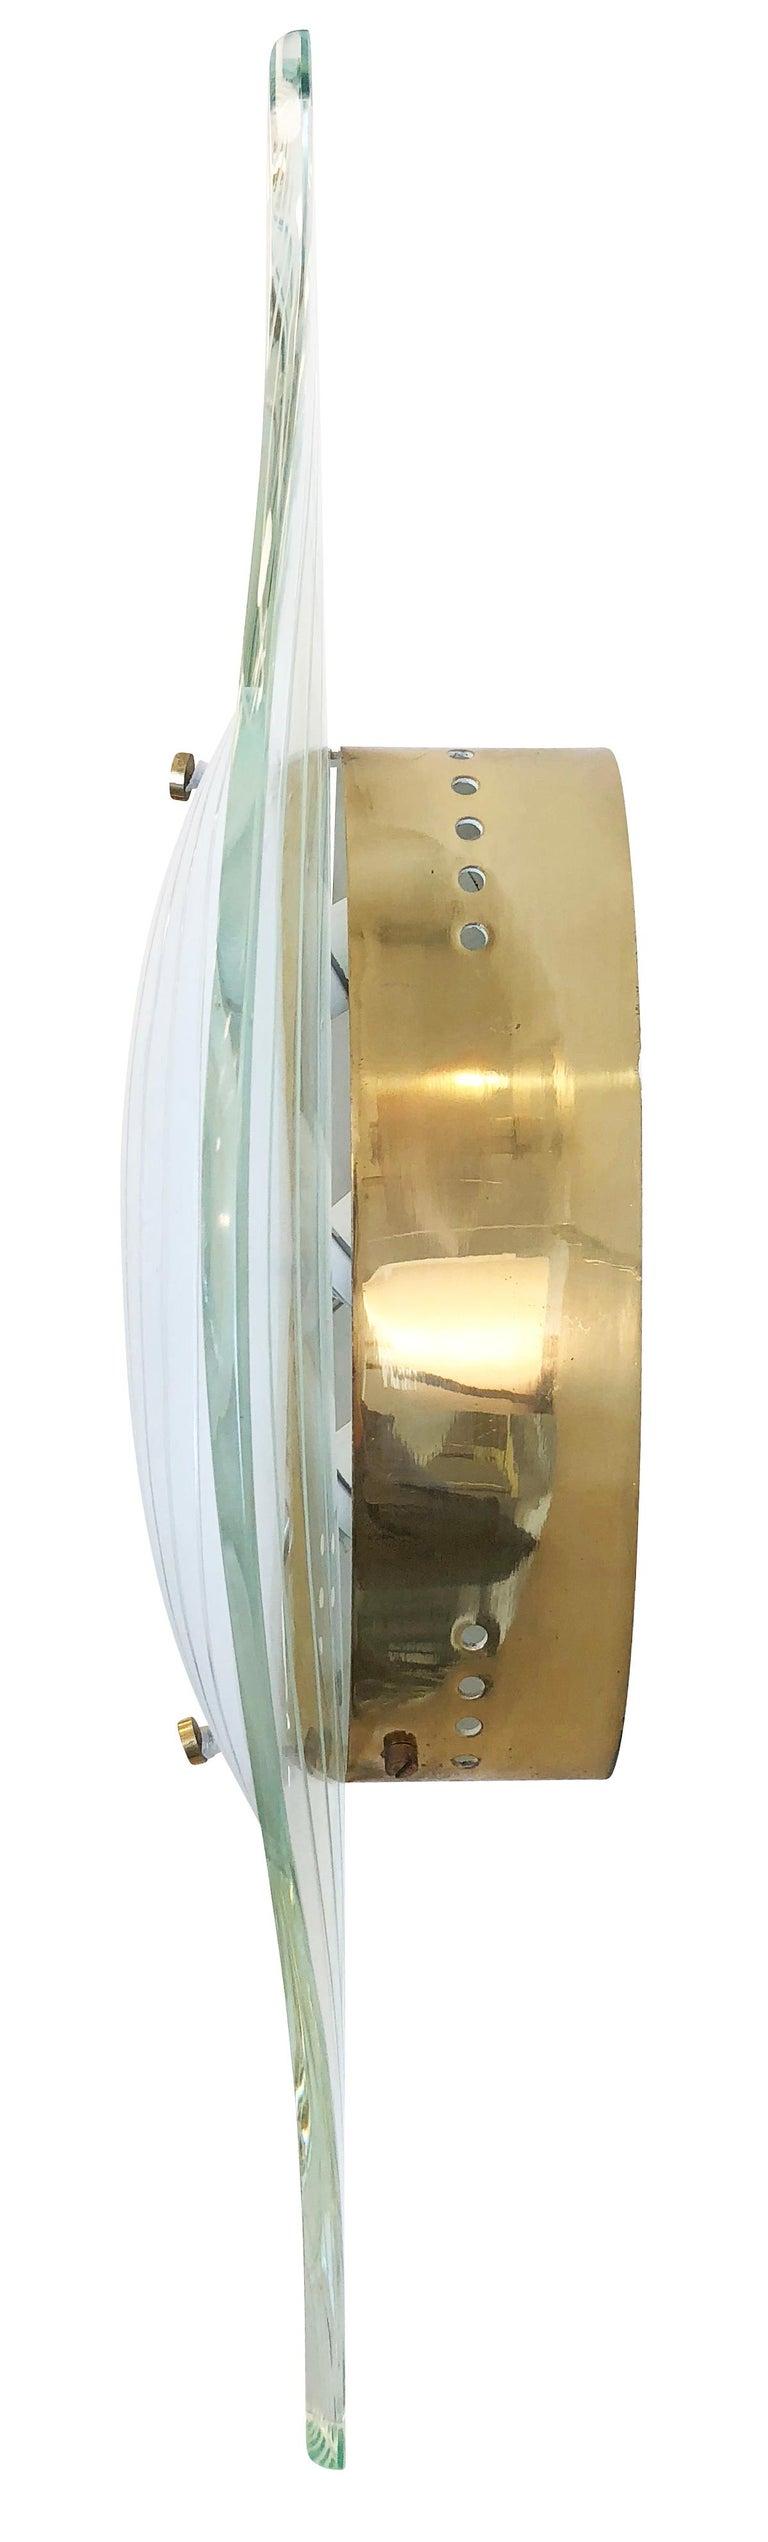 Italian Fontana Arte Flush Mount Model 2340 by Max Ingrand For Sale